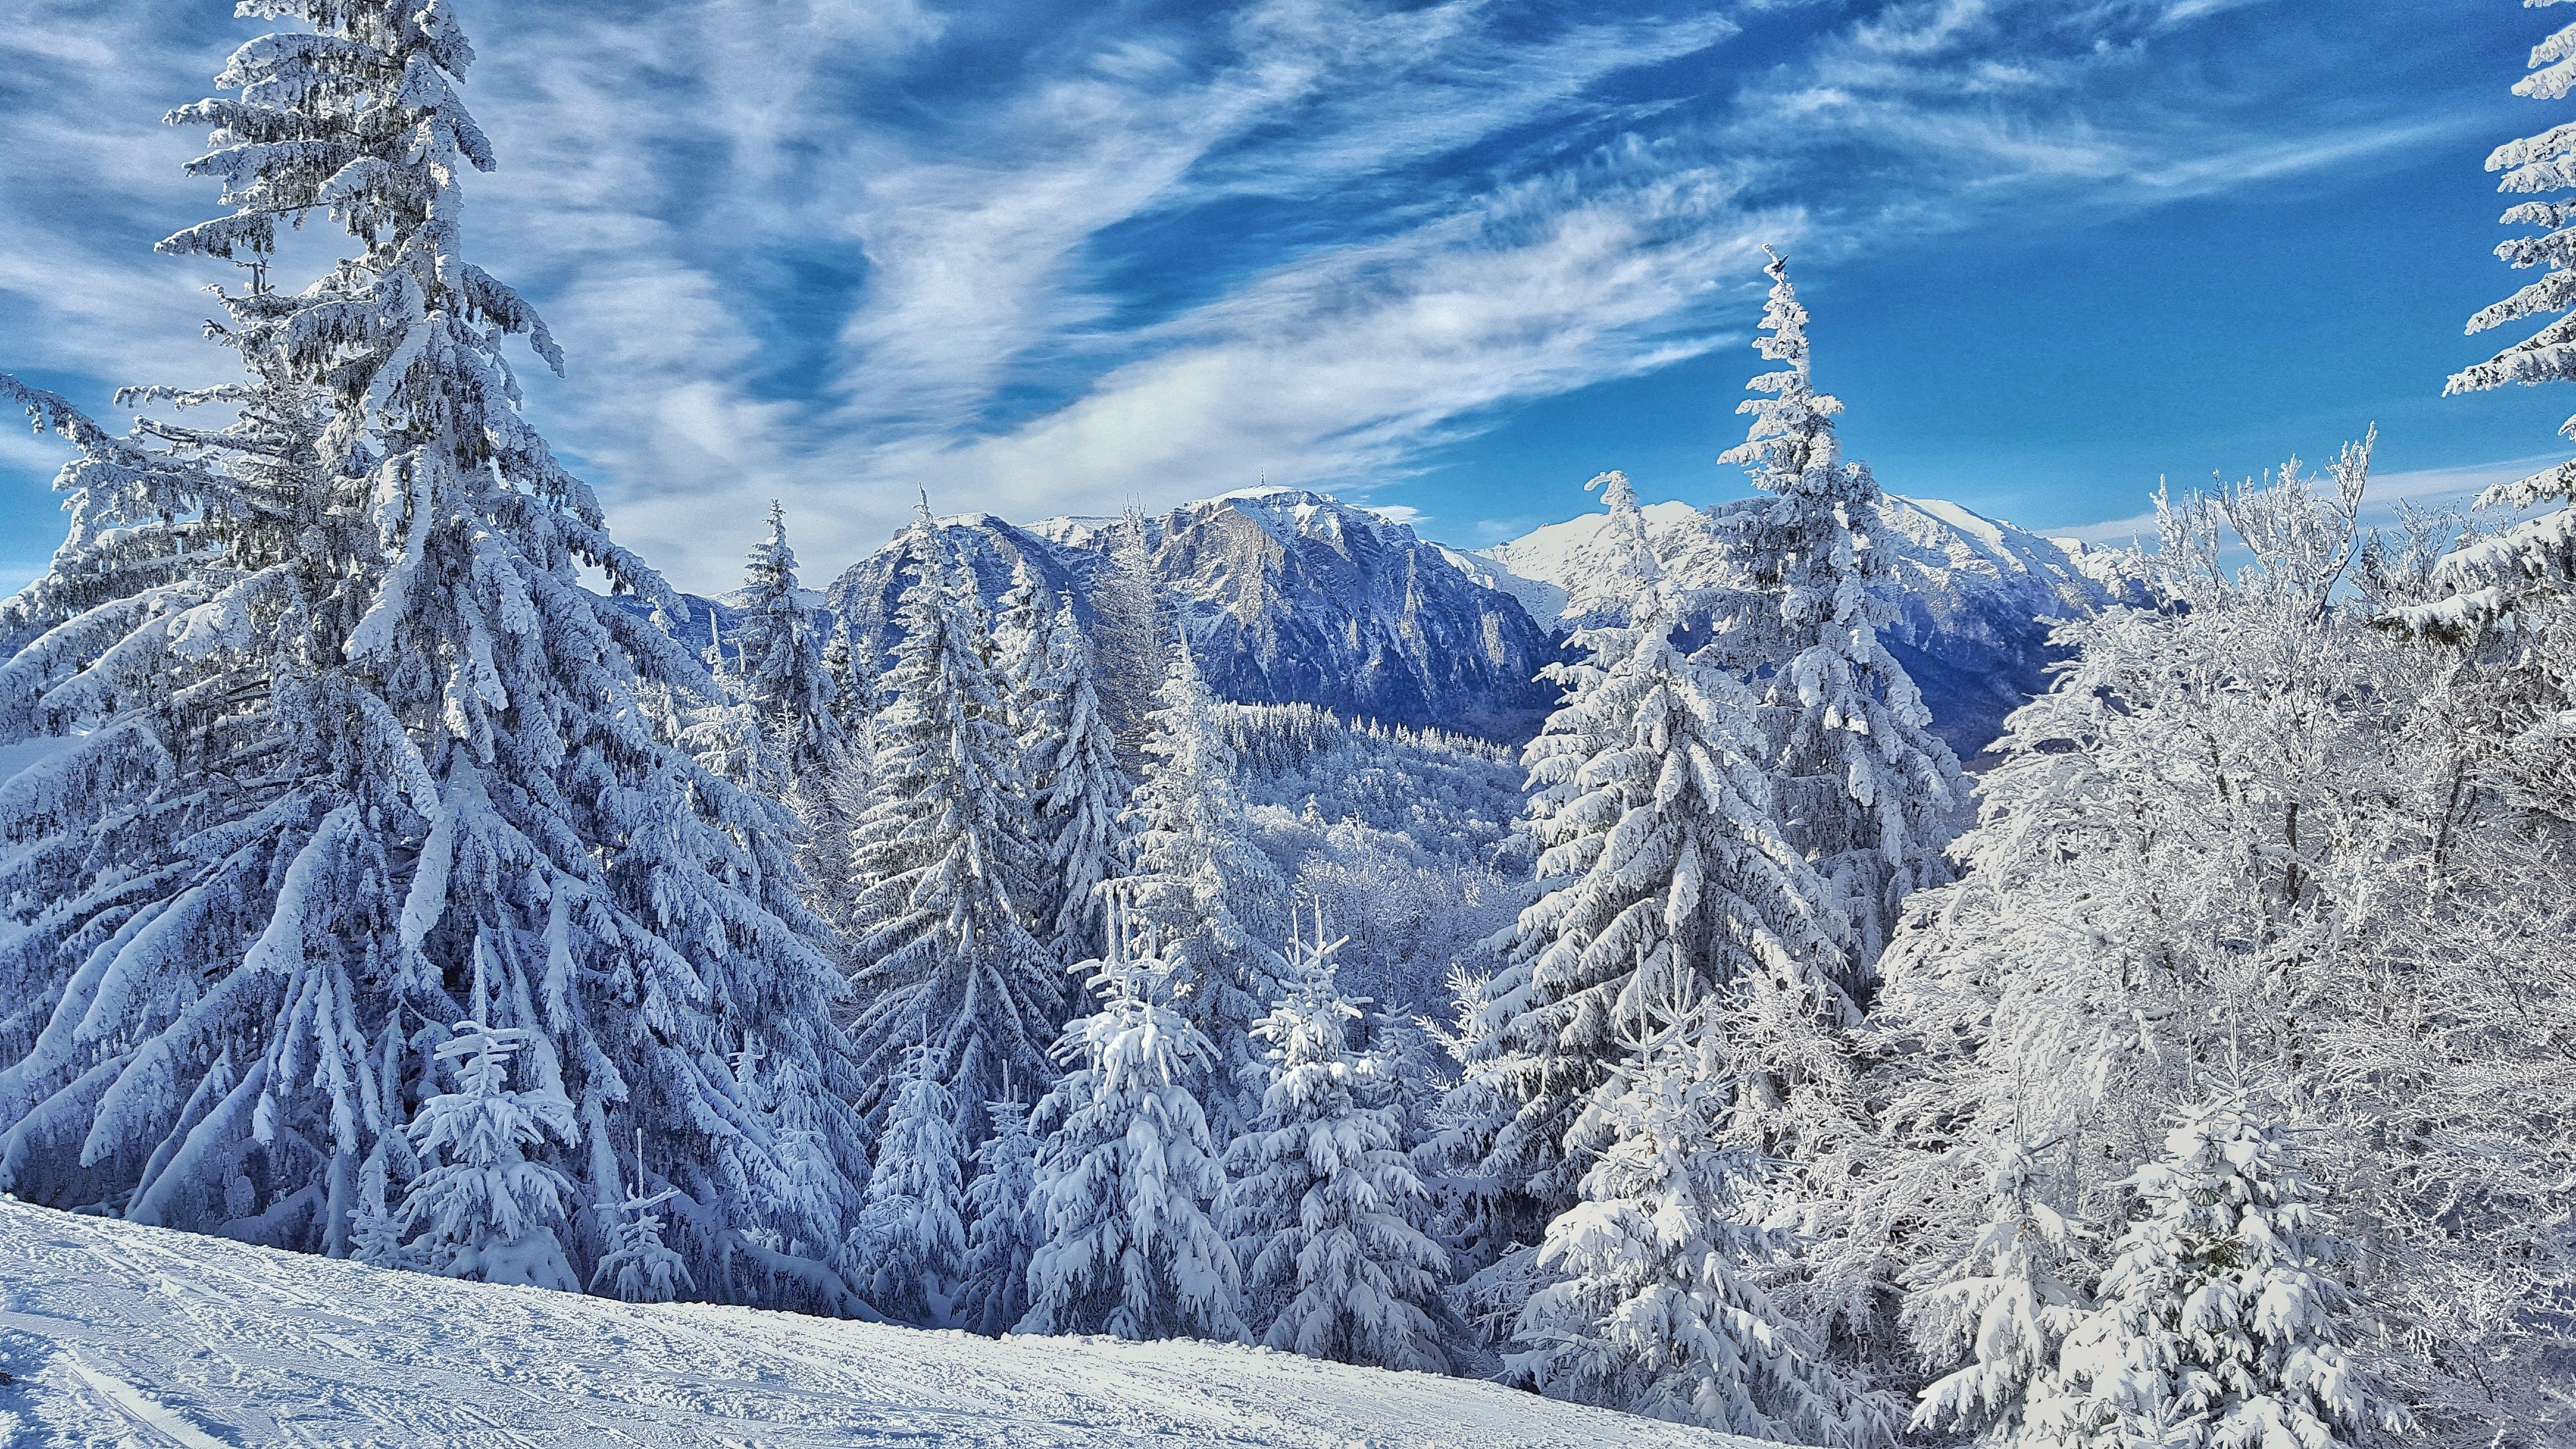 Обои На Рабочий На Телефон Зима